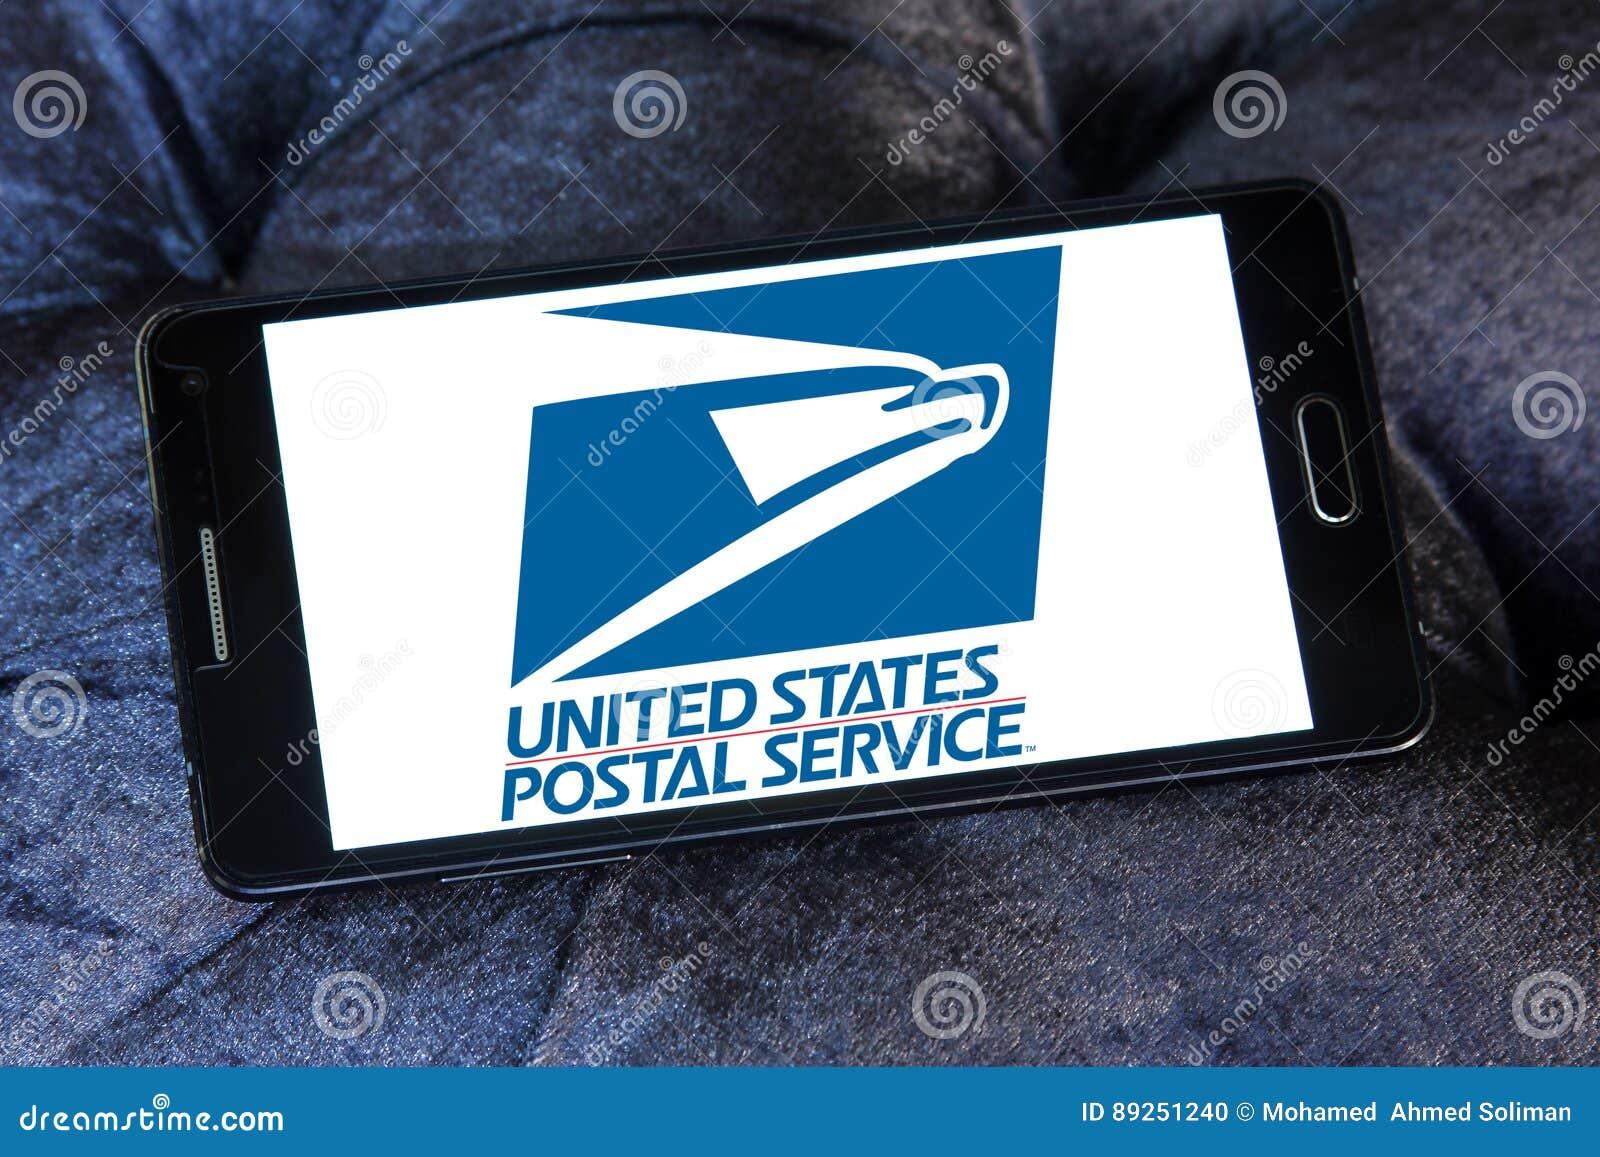 United states postal service logo editorial image image of united states postal service logo buycottarizona